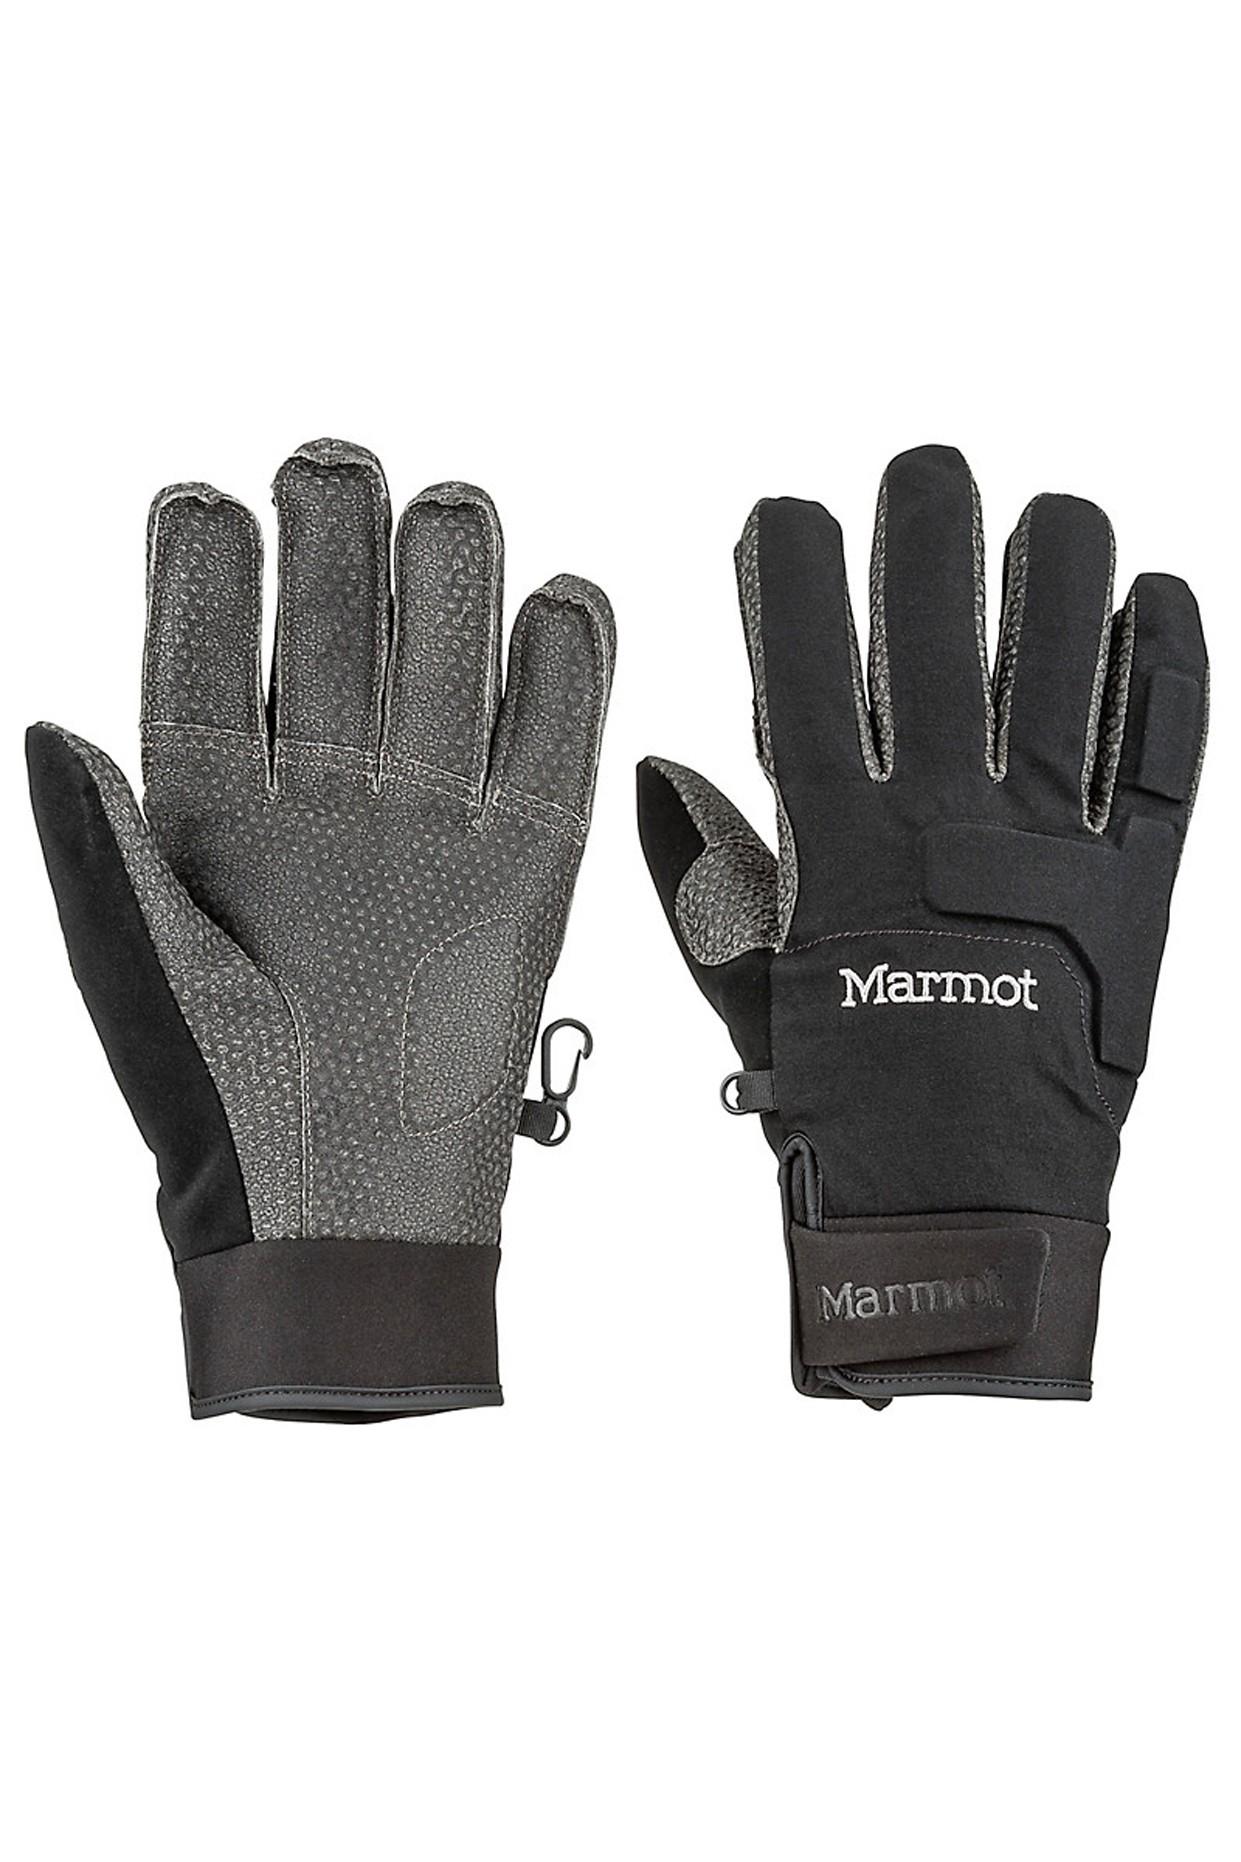 XT Glove MARMOT